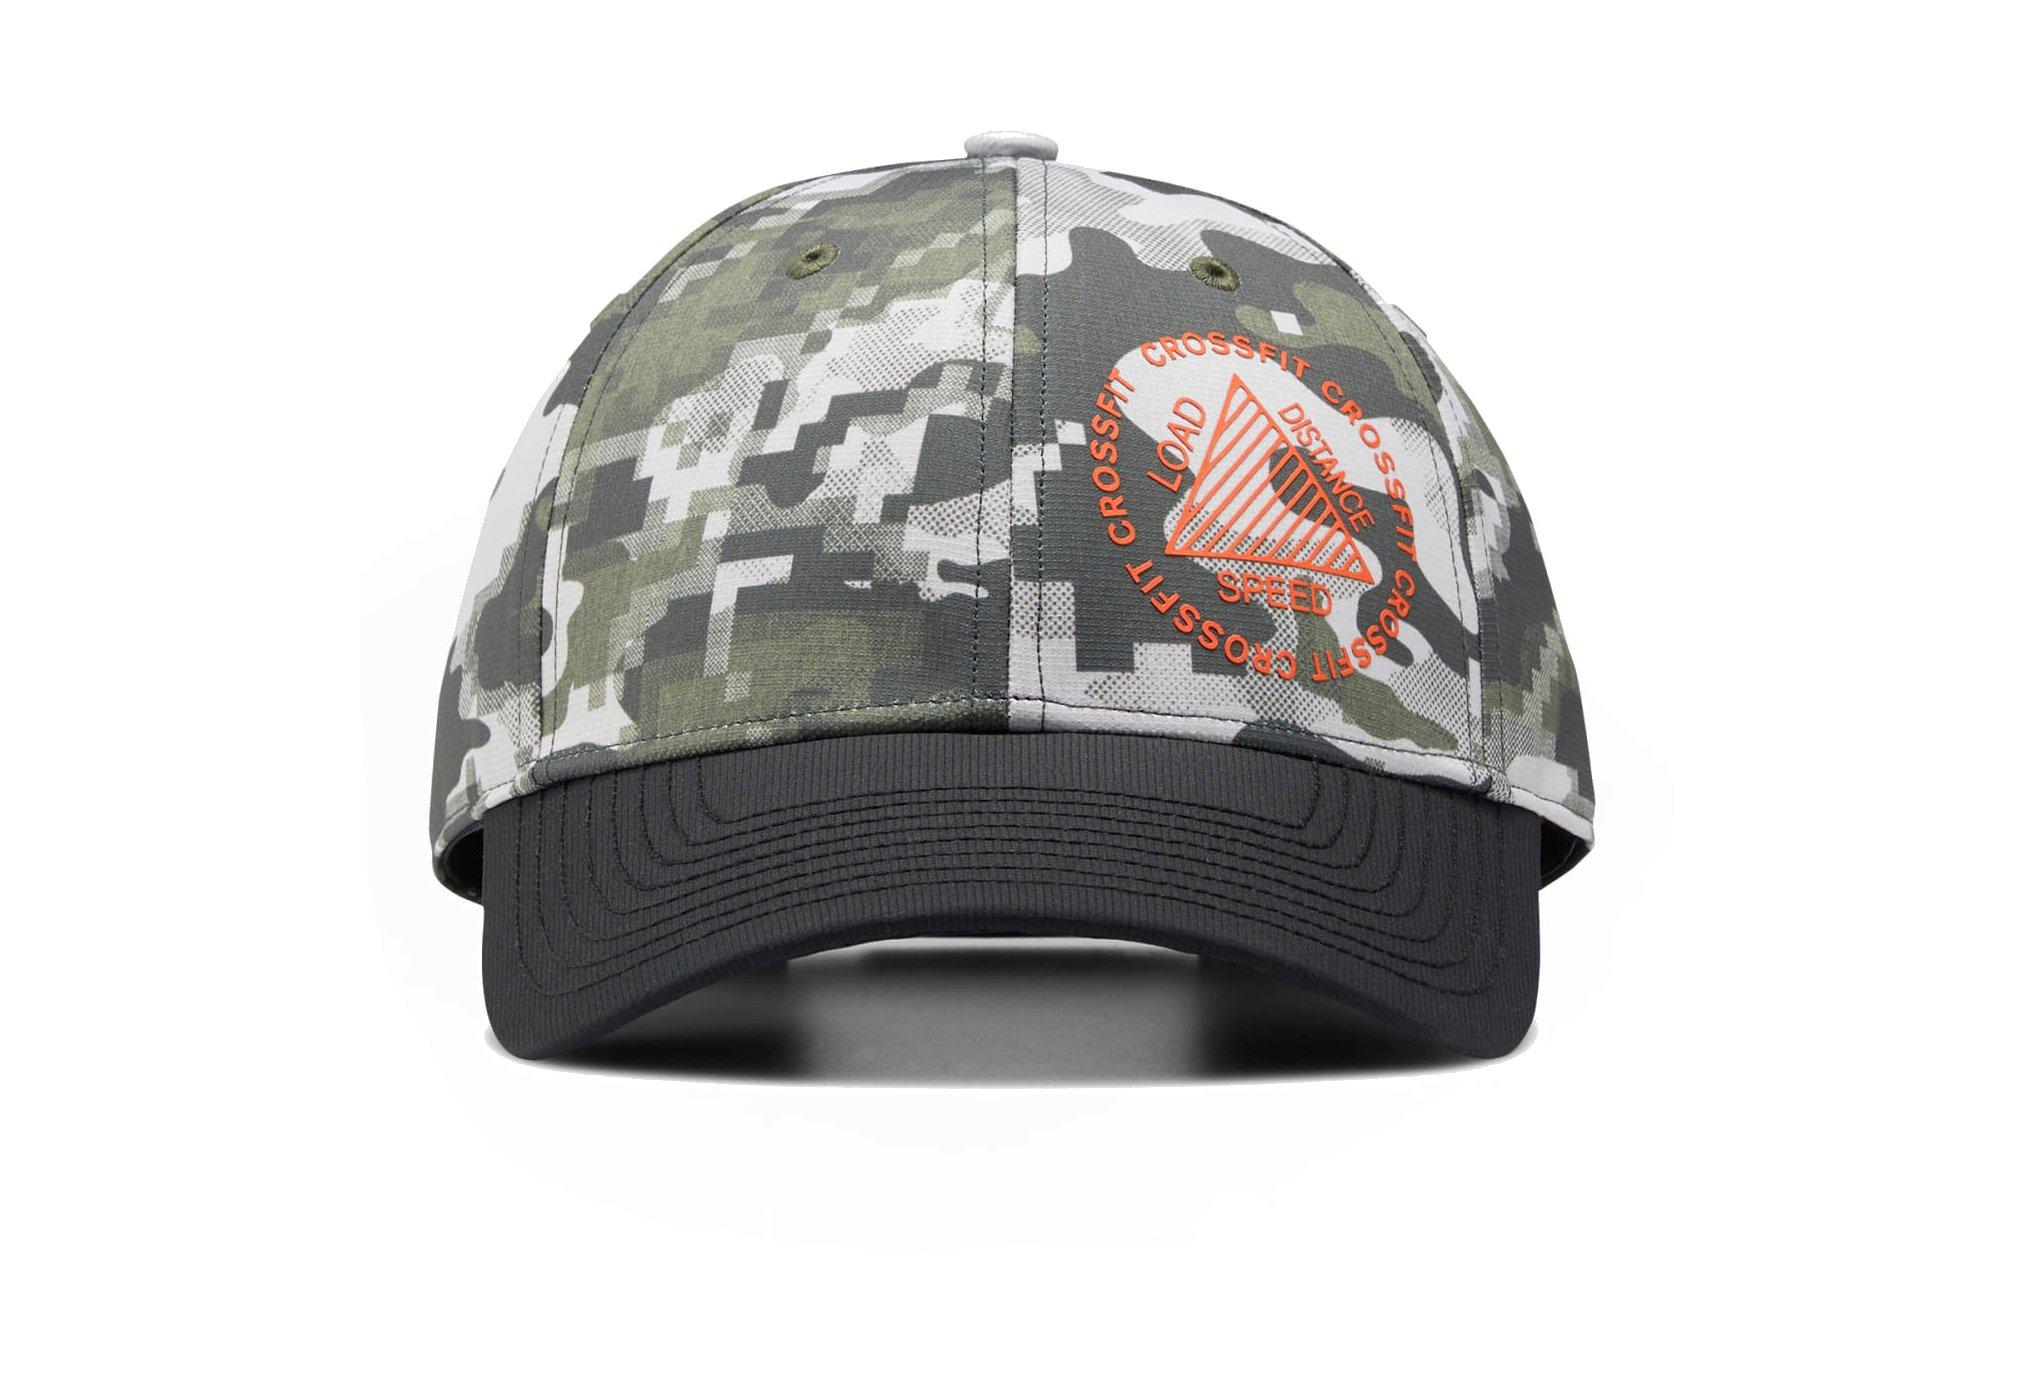 Reebok Baseball crossfit casquettes / bandeaux